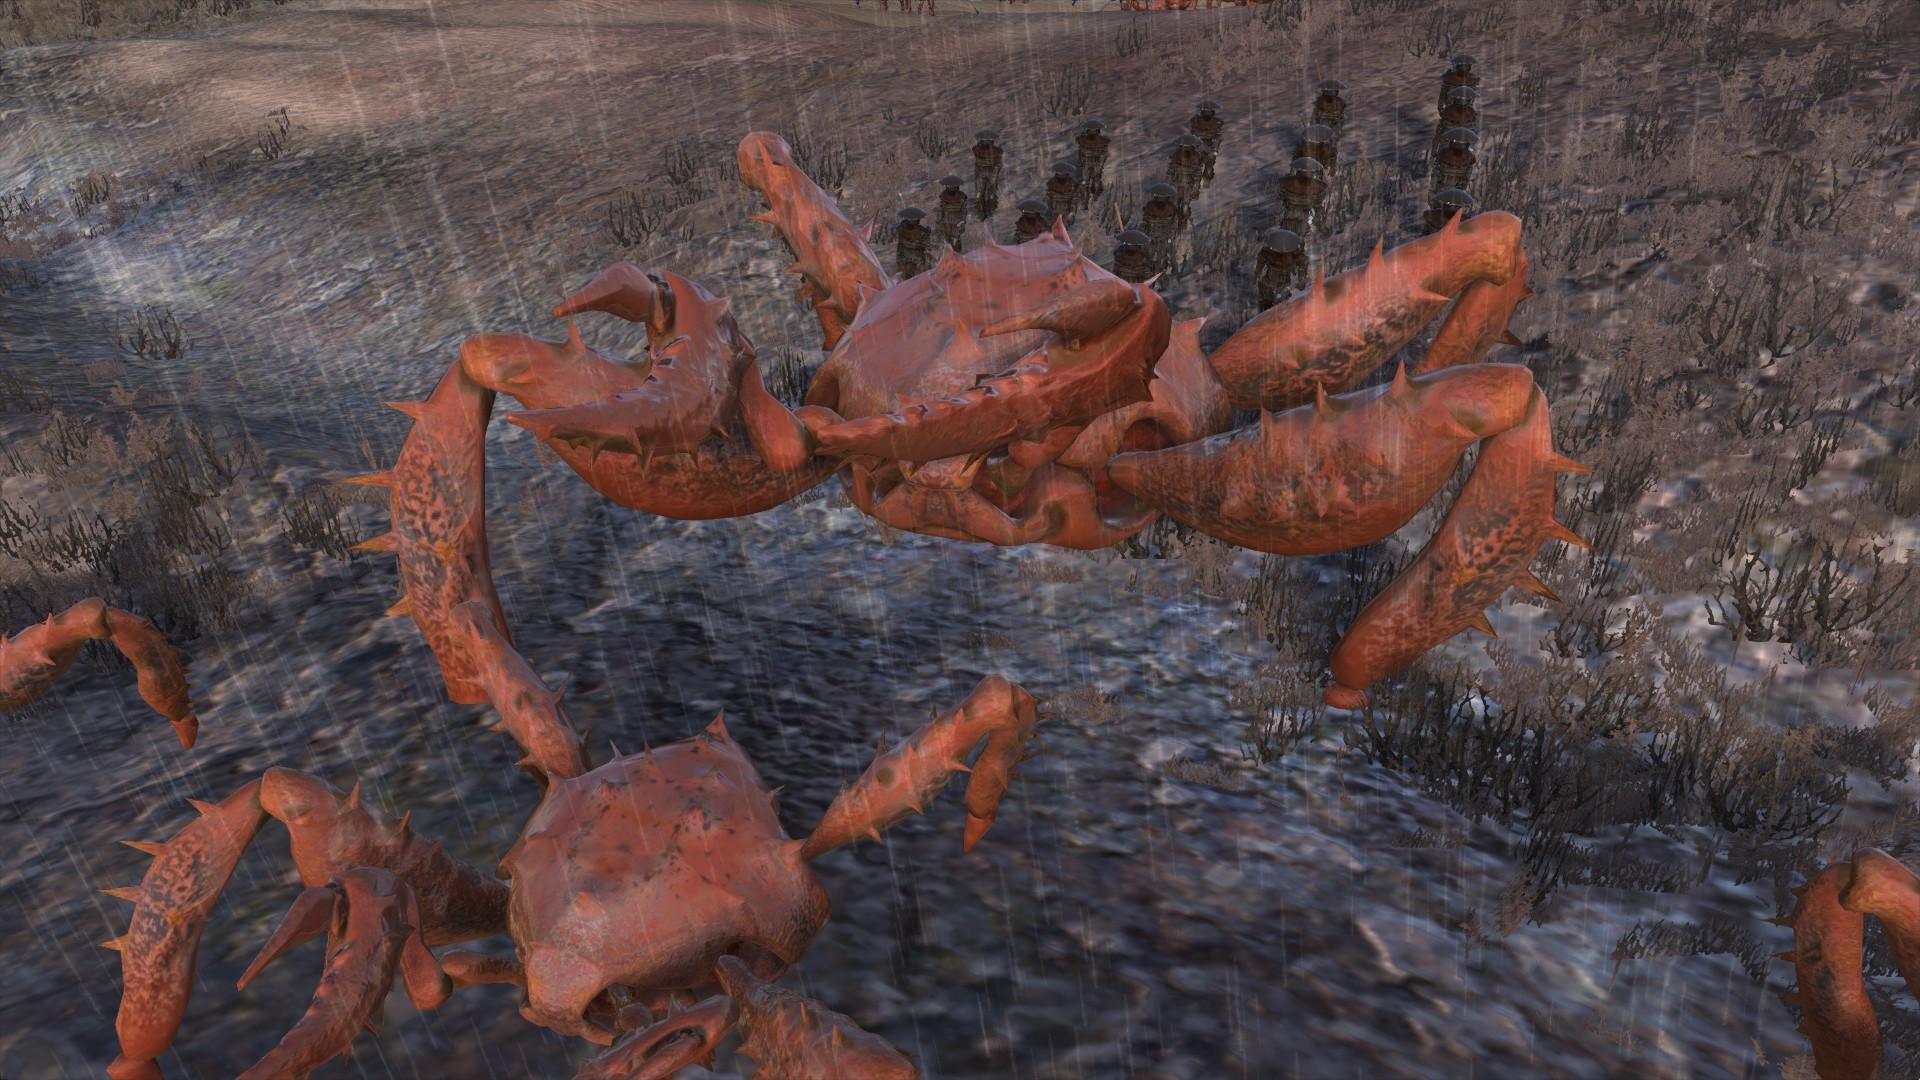 The Crabinator